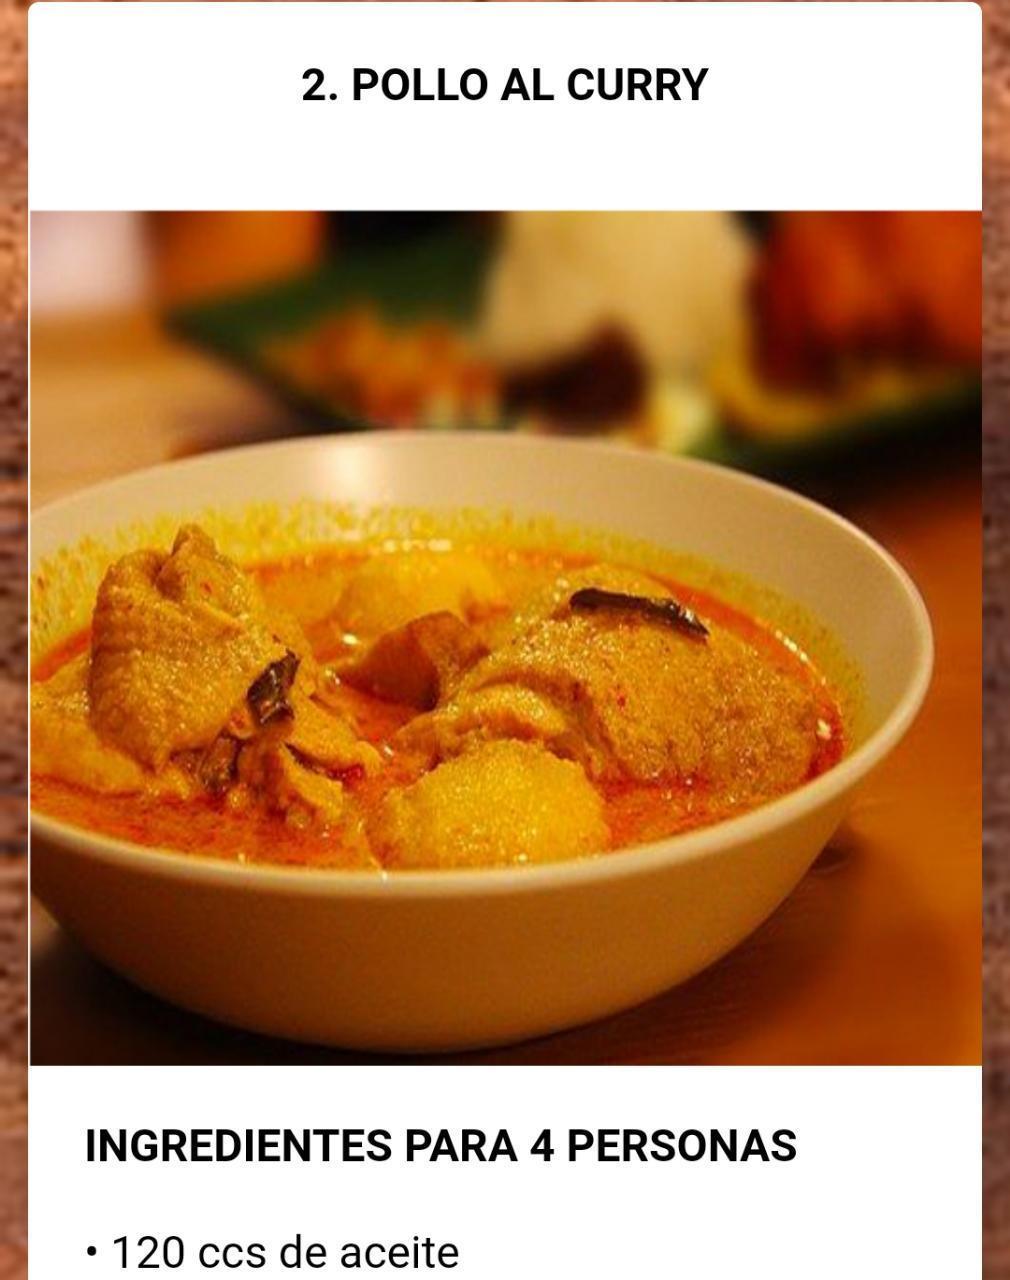 Recetas De Cocina Caceras Faciles De Preparar For Android